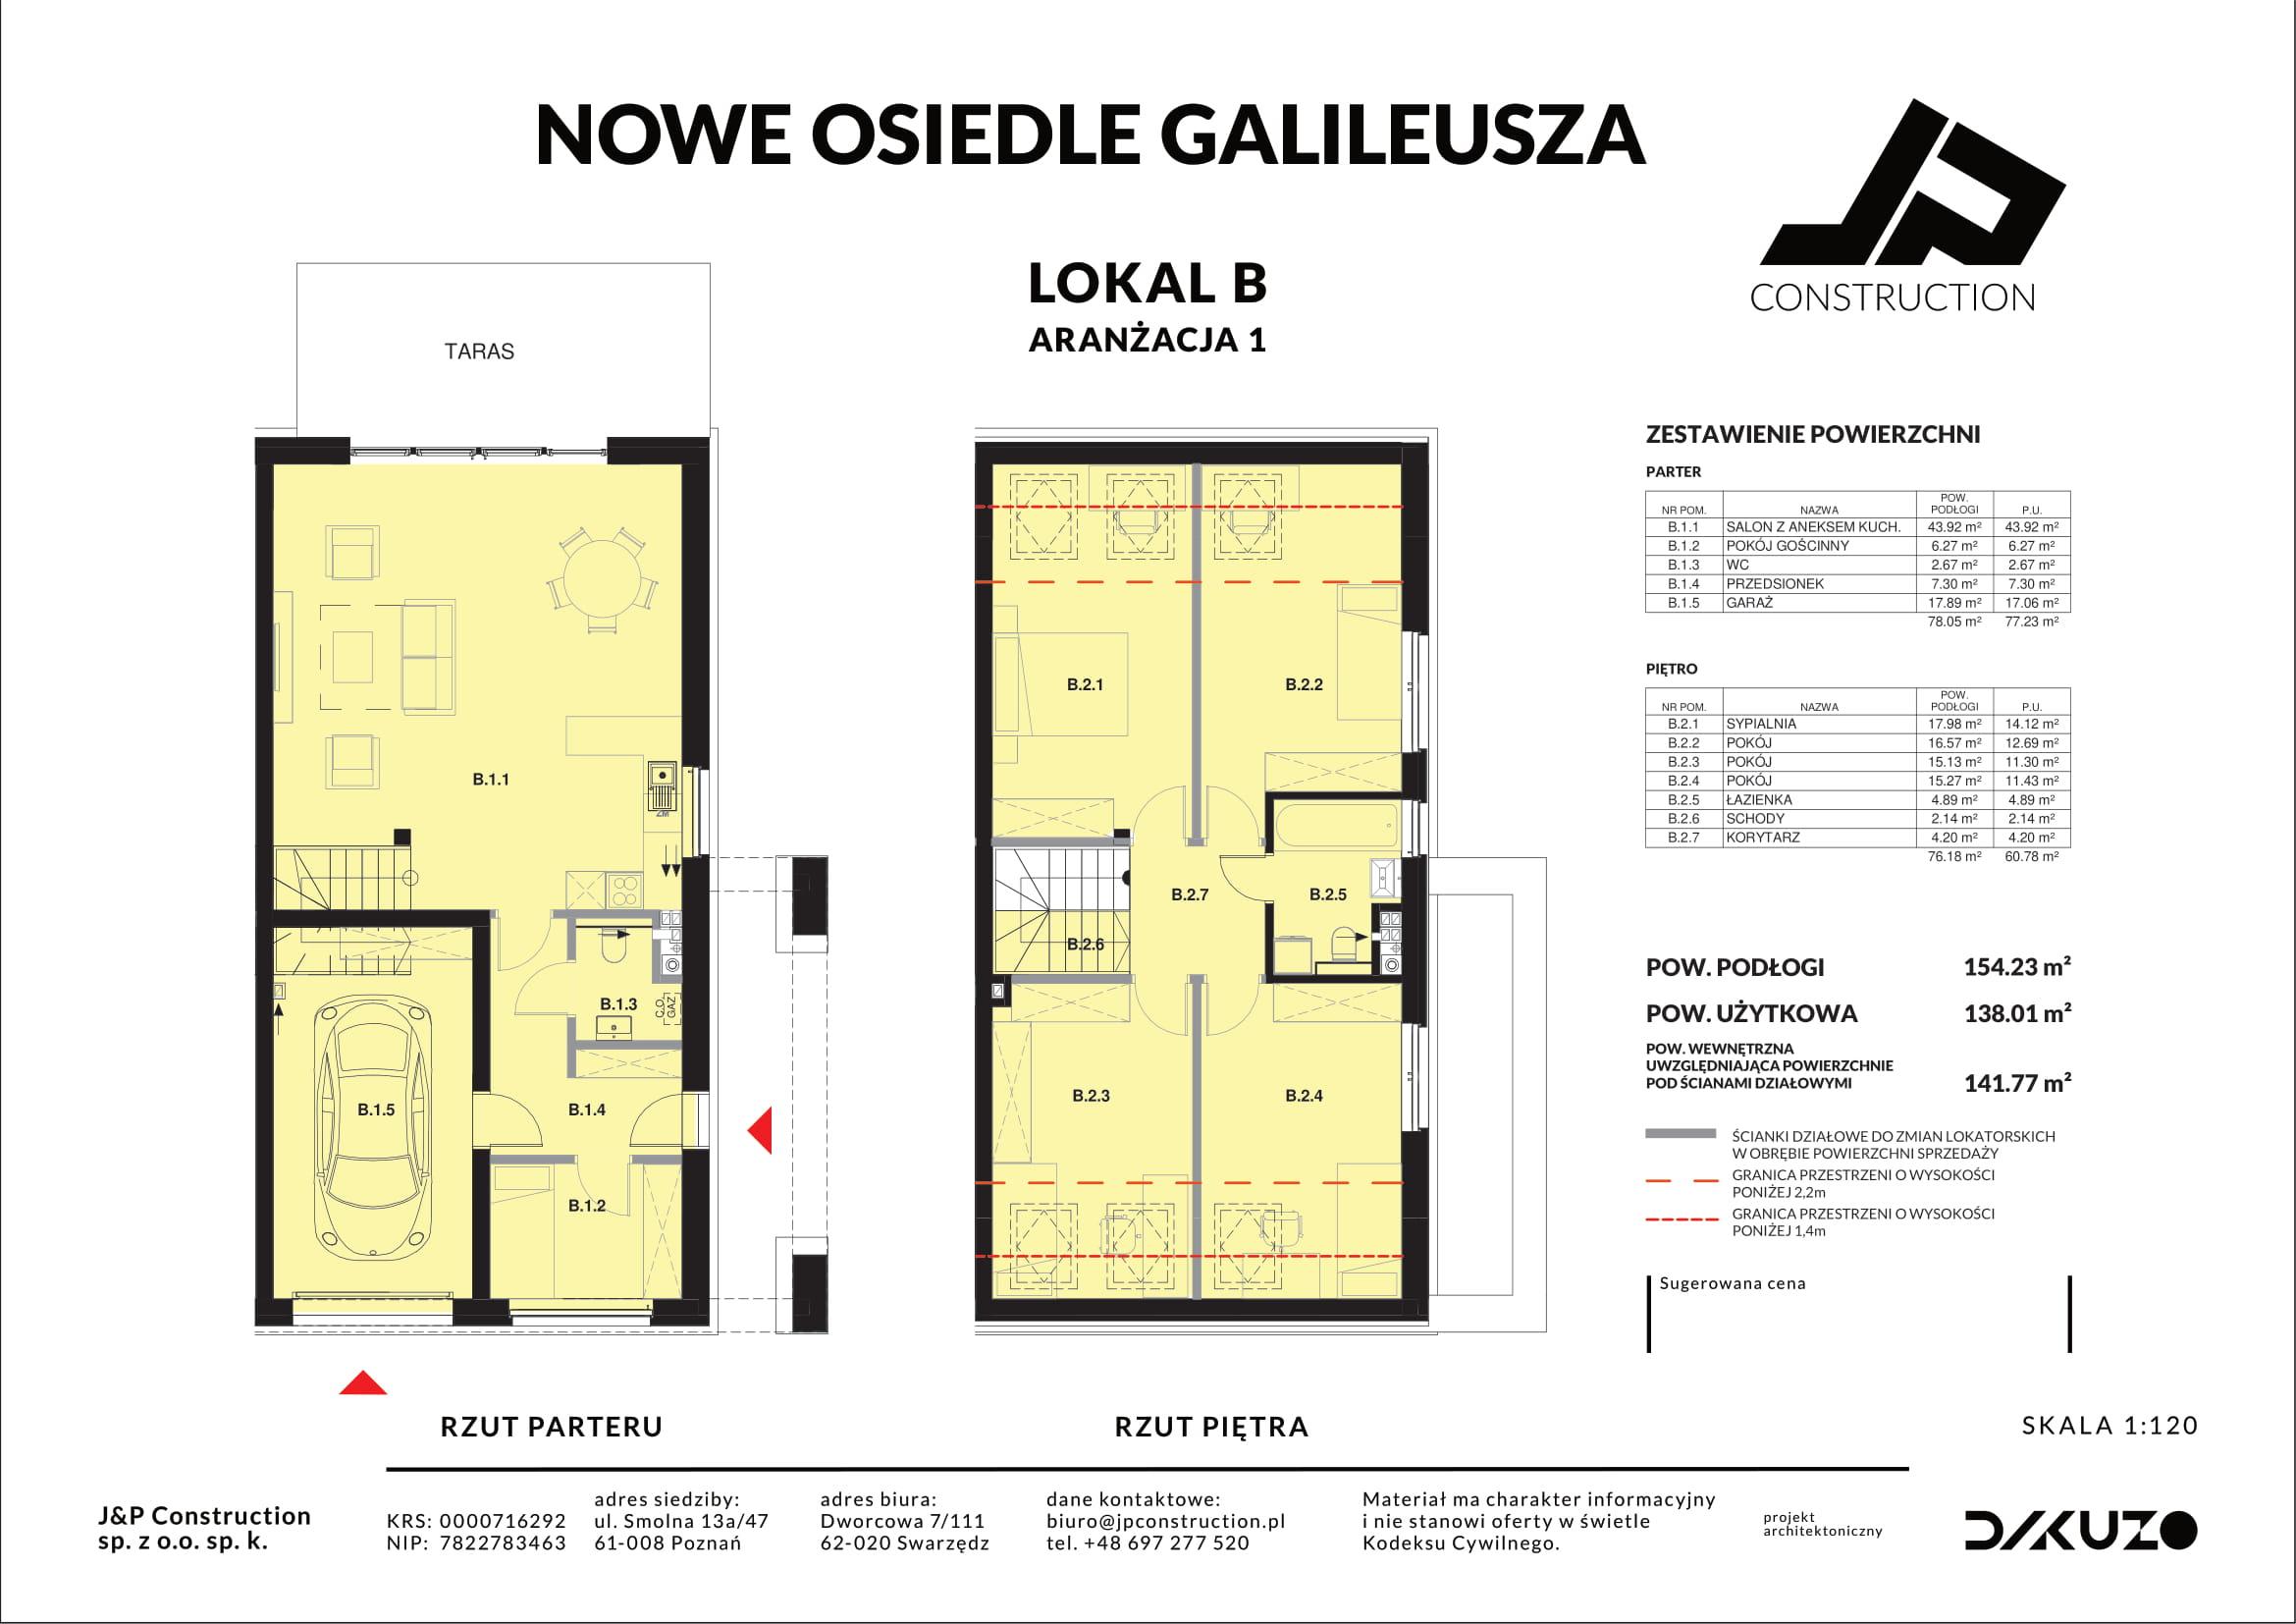 ZALASEWO-GAL-KARTA-LOKAL-B-aranzacja-1-1